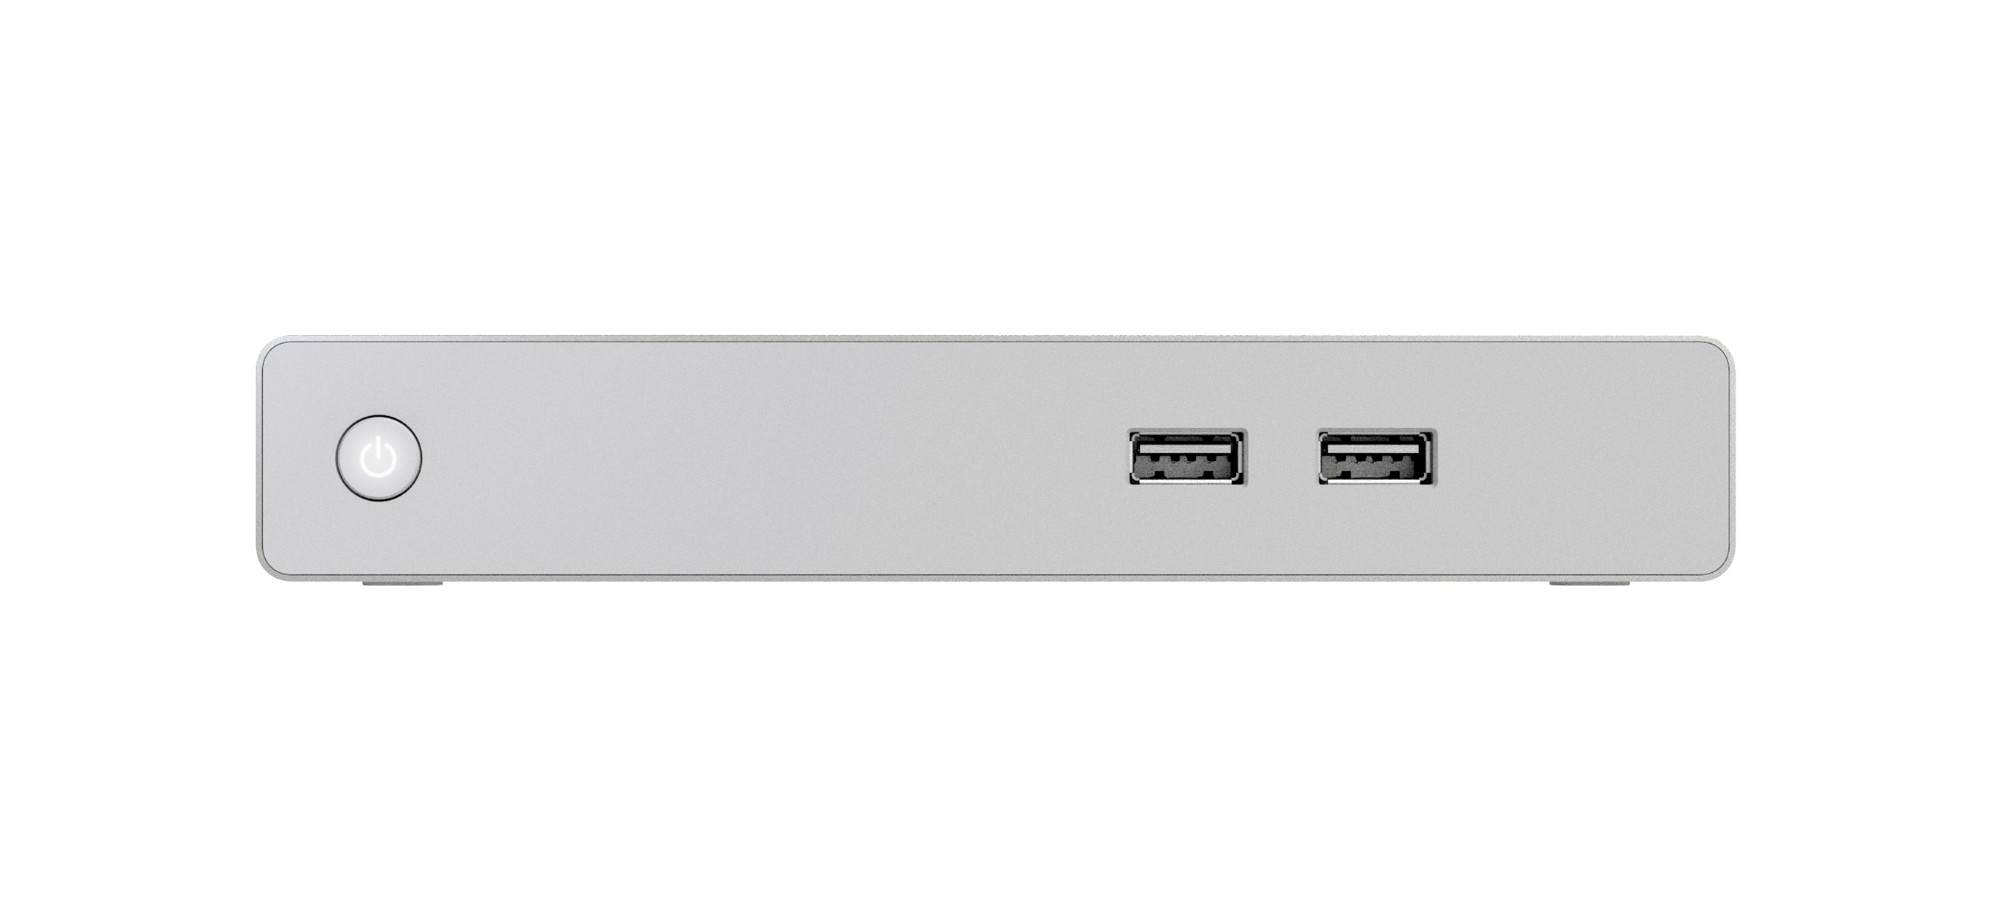 AMX ACR-5100 3840 x 2160pixels Ethernet LAN